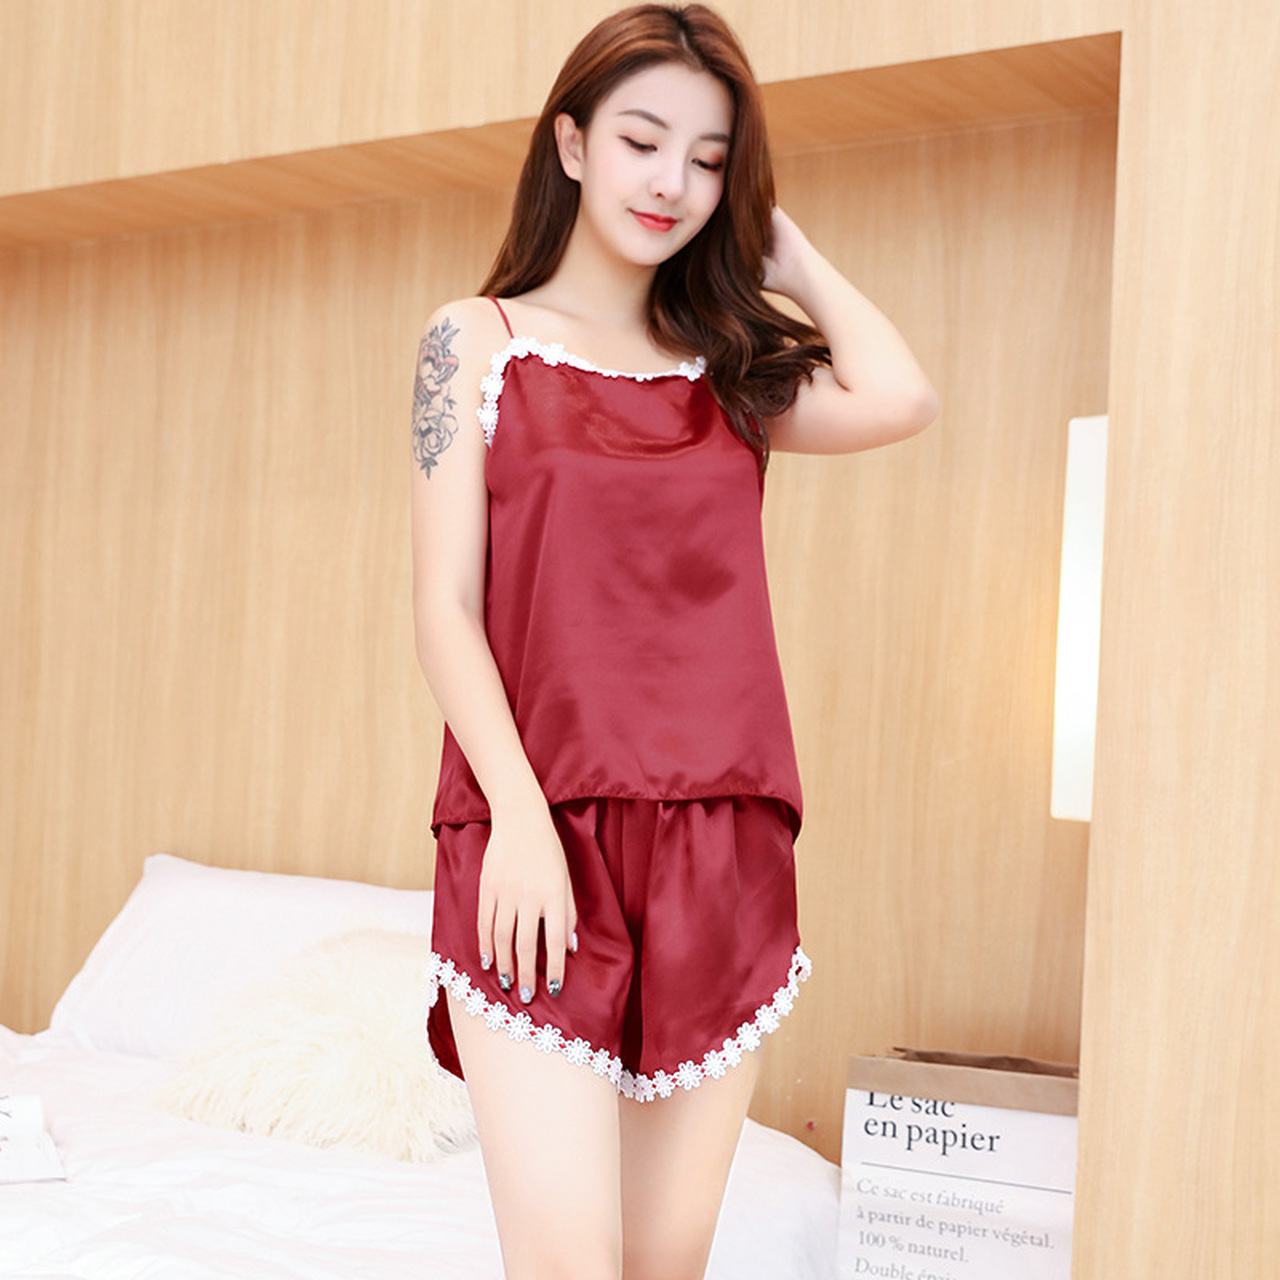 fb057c9abb ... Ladies Sexy Summer Night Dress Women Satin Lace Sleepwear Silk  Nightgown Sleeveless V-Neck Nightdress ...